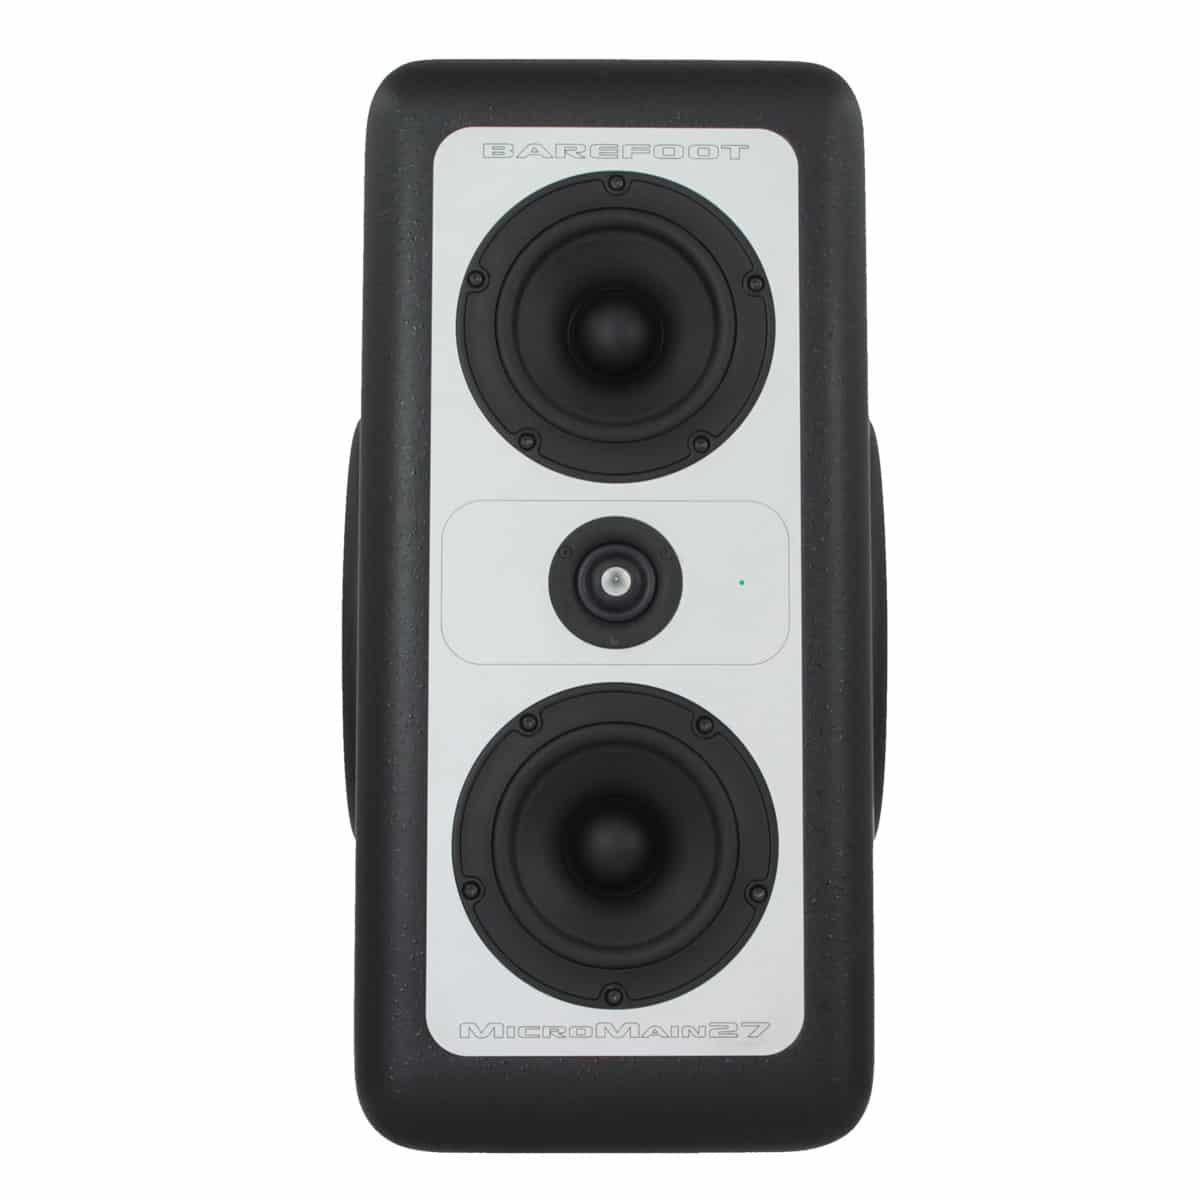 Barefoot Sound MicroMain 27 Gen2 Pro Audio, Audio Monitors, Studio Monitor Barefoot Sound Micromain 27 Gen2 4